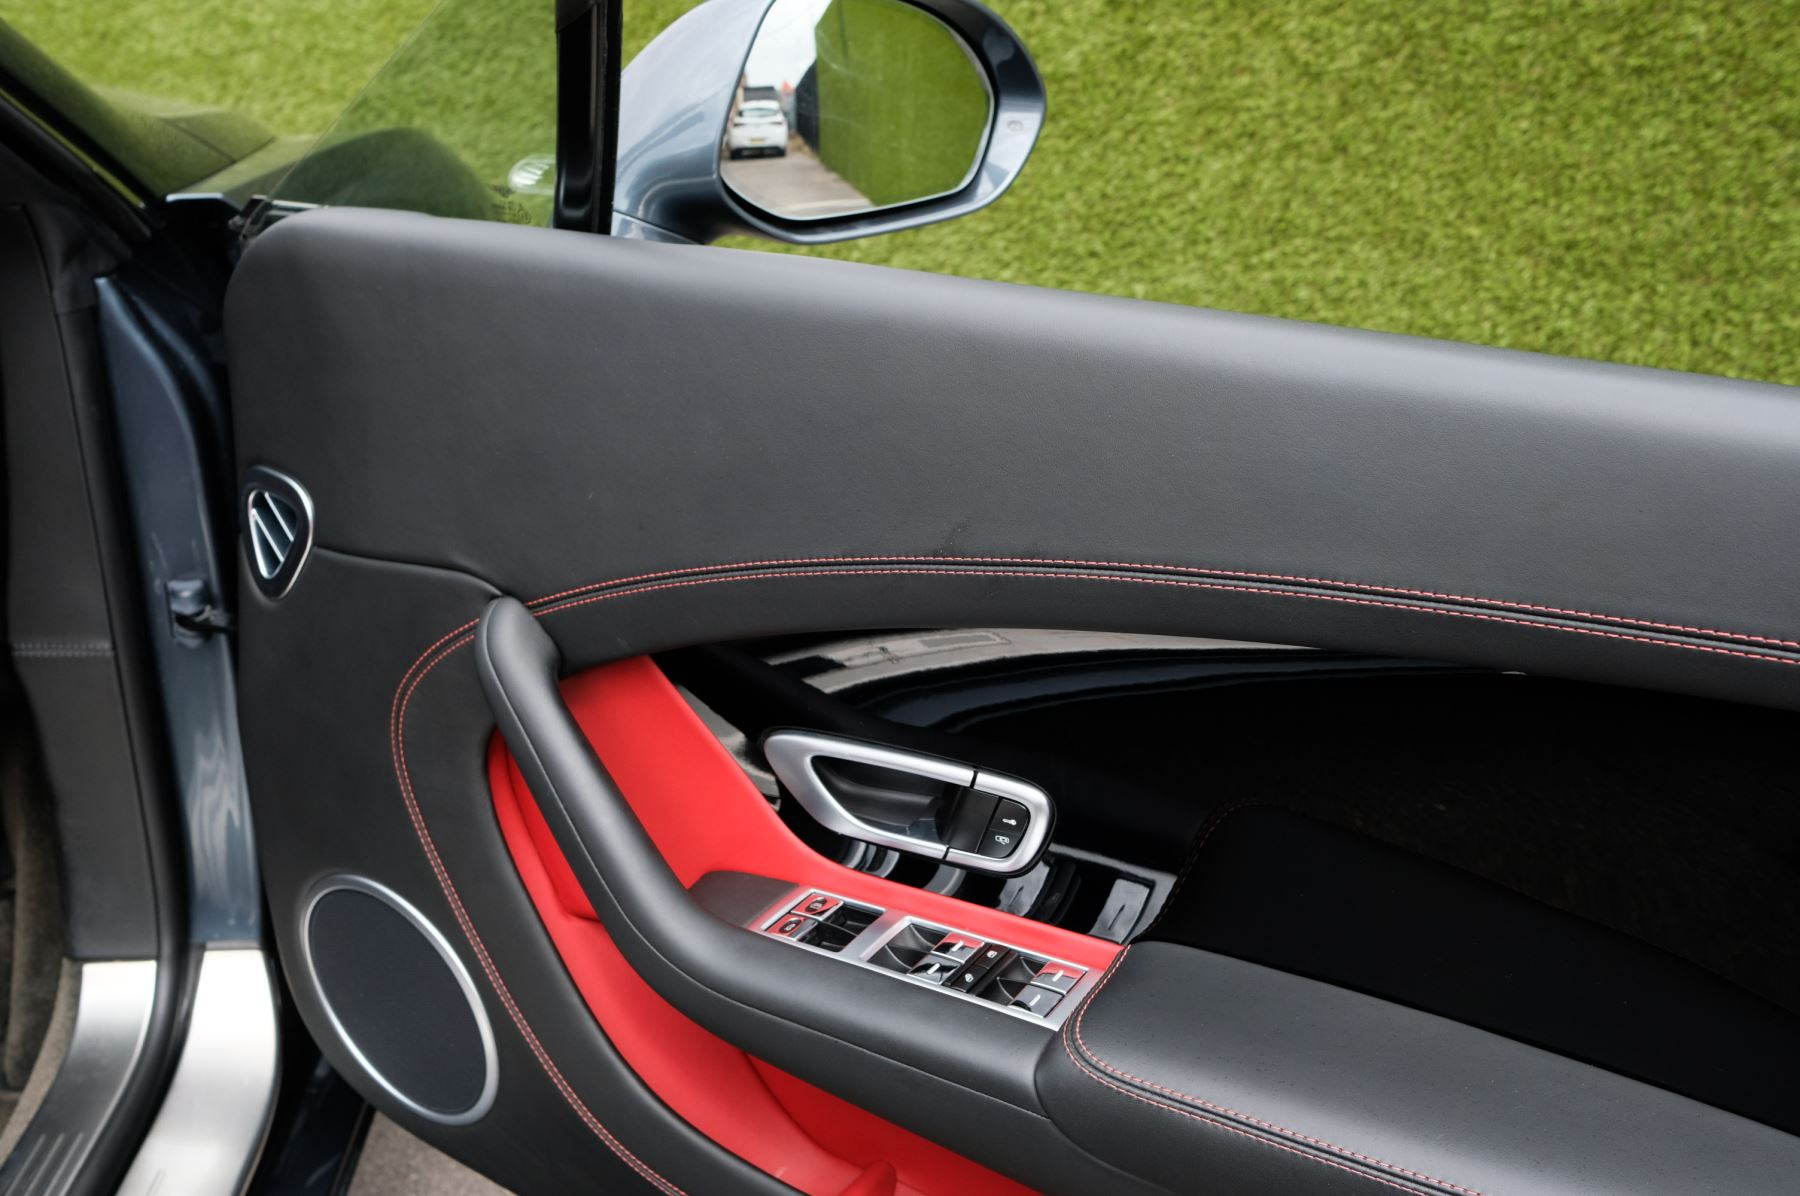 Bentley Continental GTC 6.0 W12 Speed - Massage Seats & Ventilation - Neck Warmer - Rear View Camera image 14